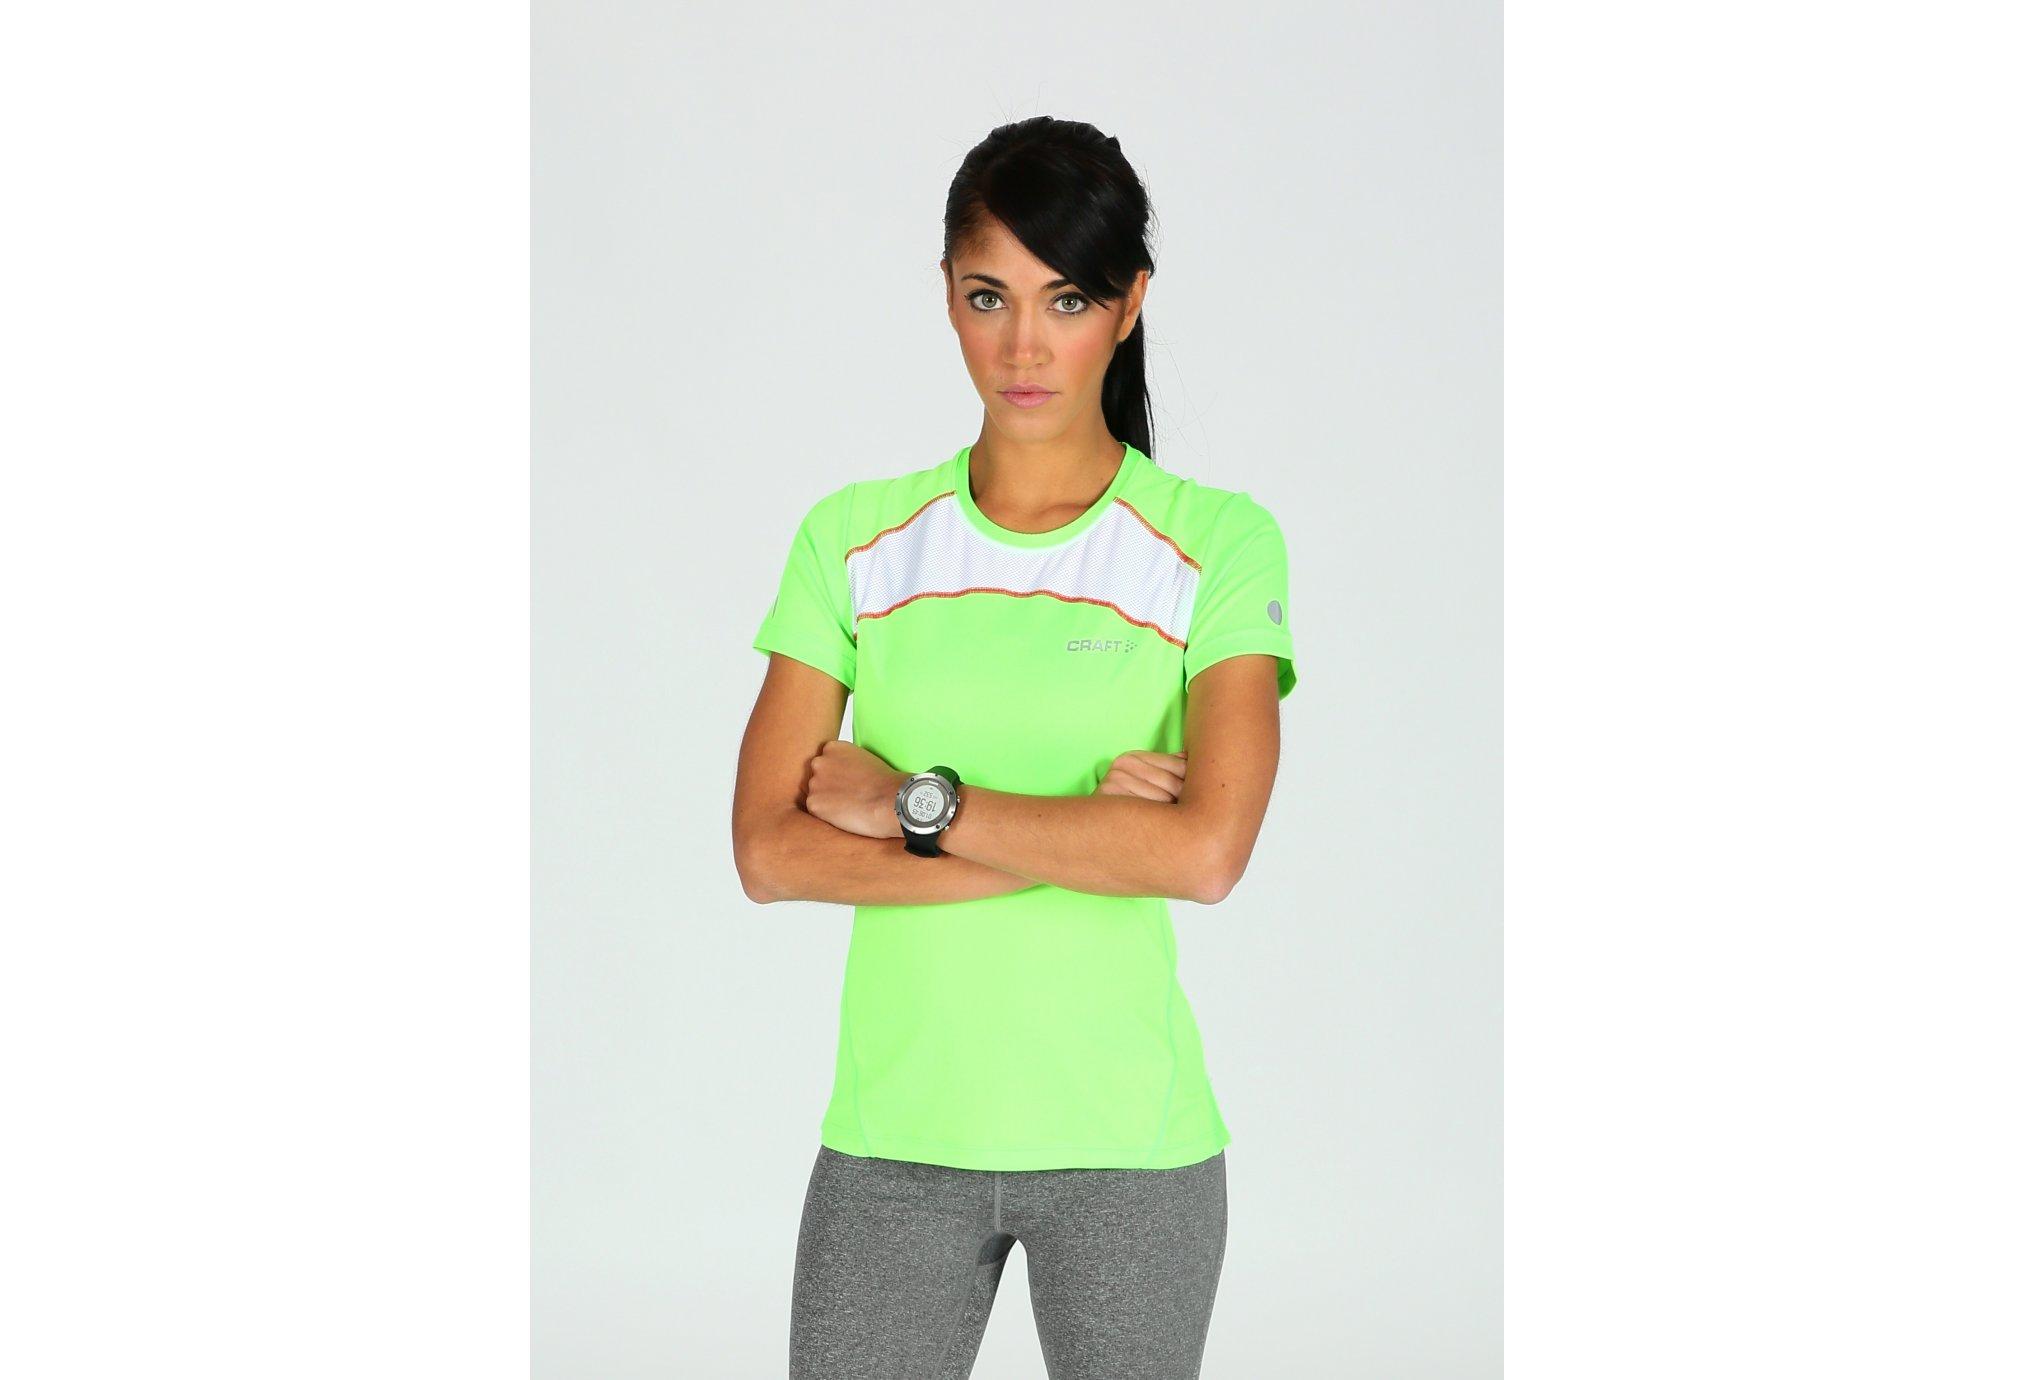 Craft Tee-shirt Run Devotion W Diététique Vêtements femme